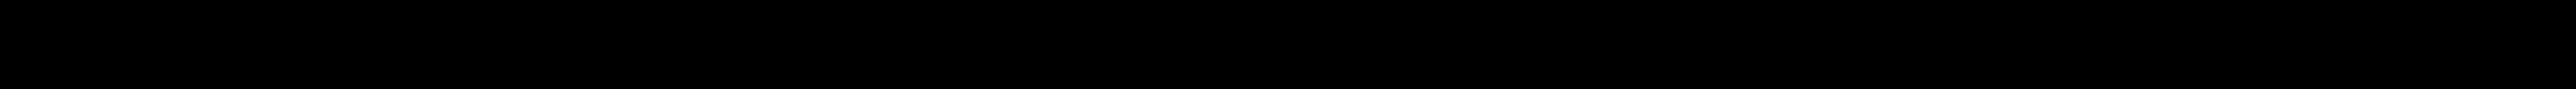 brixton-line-3